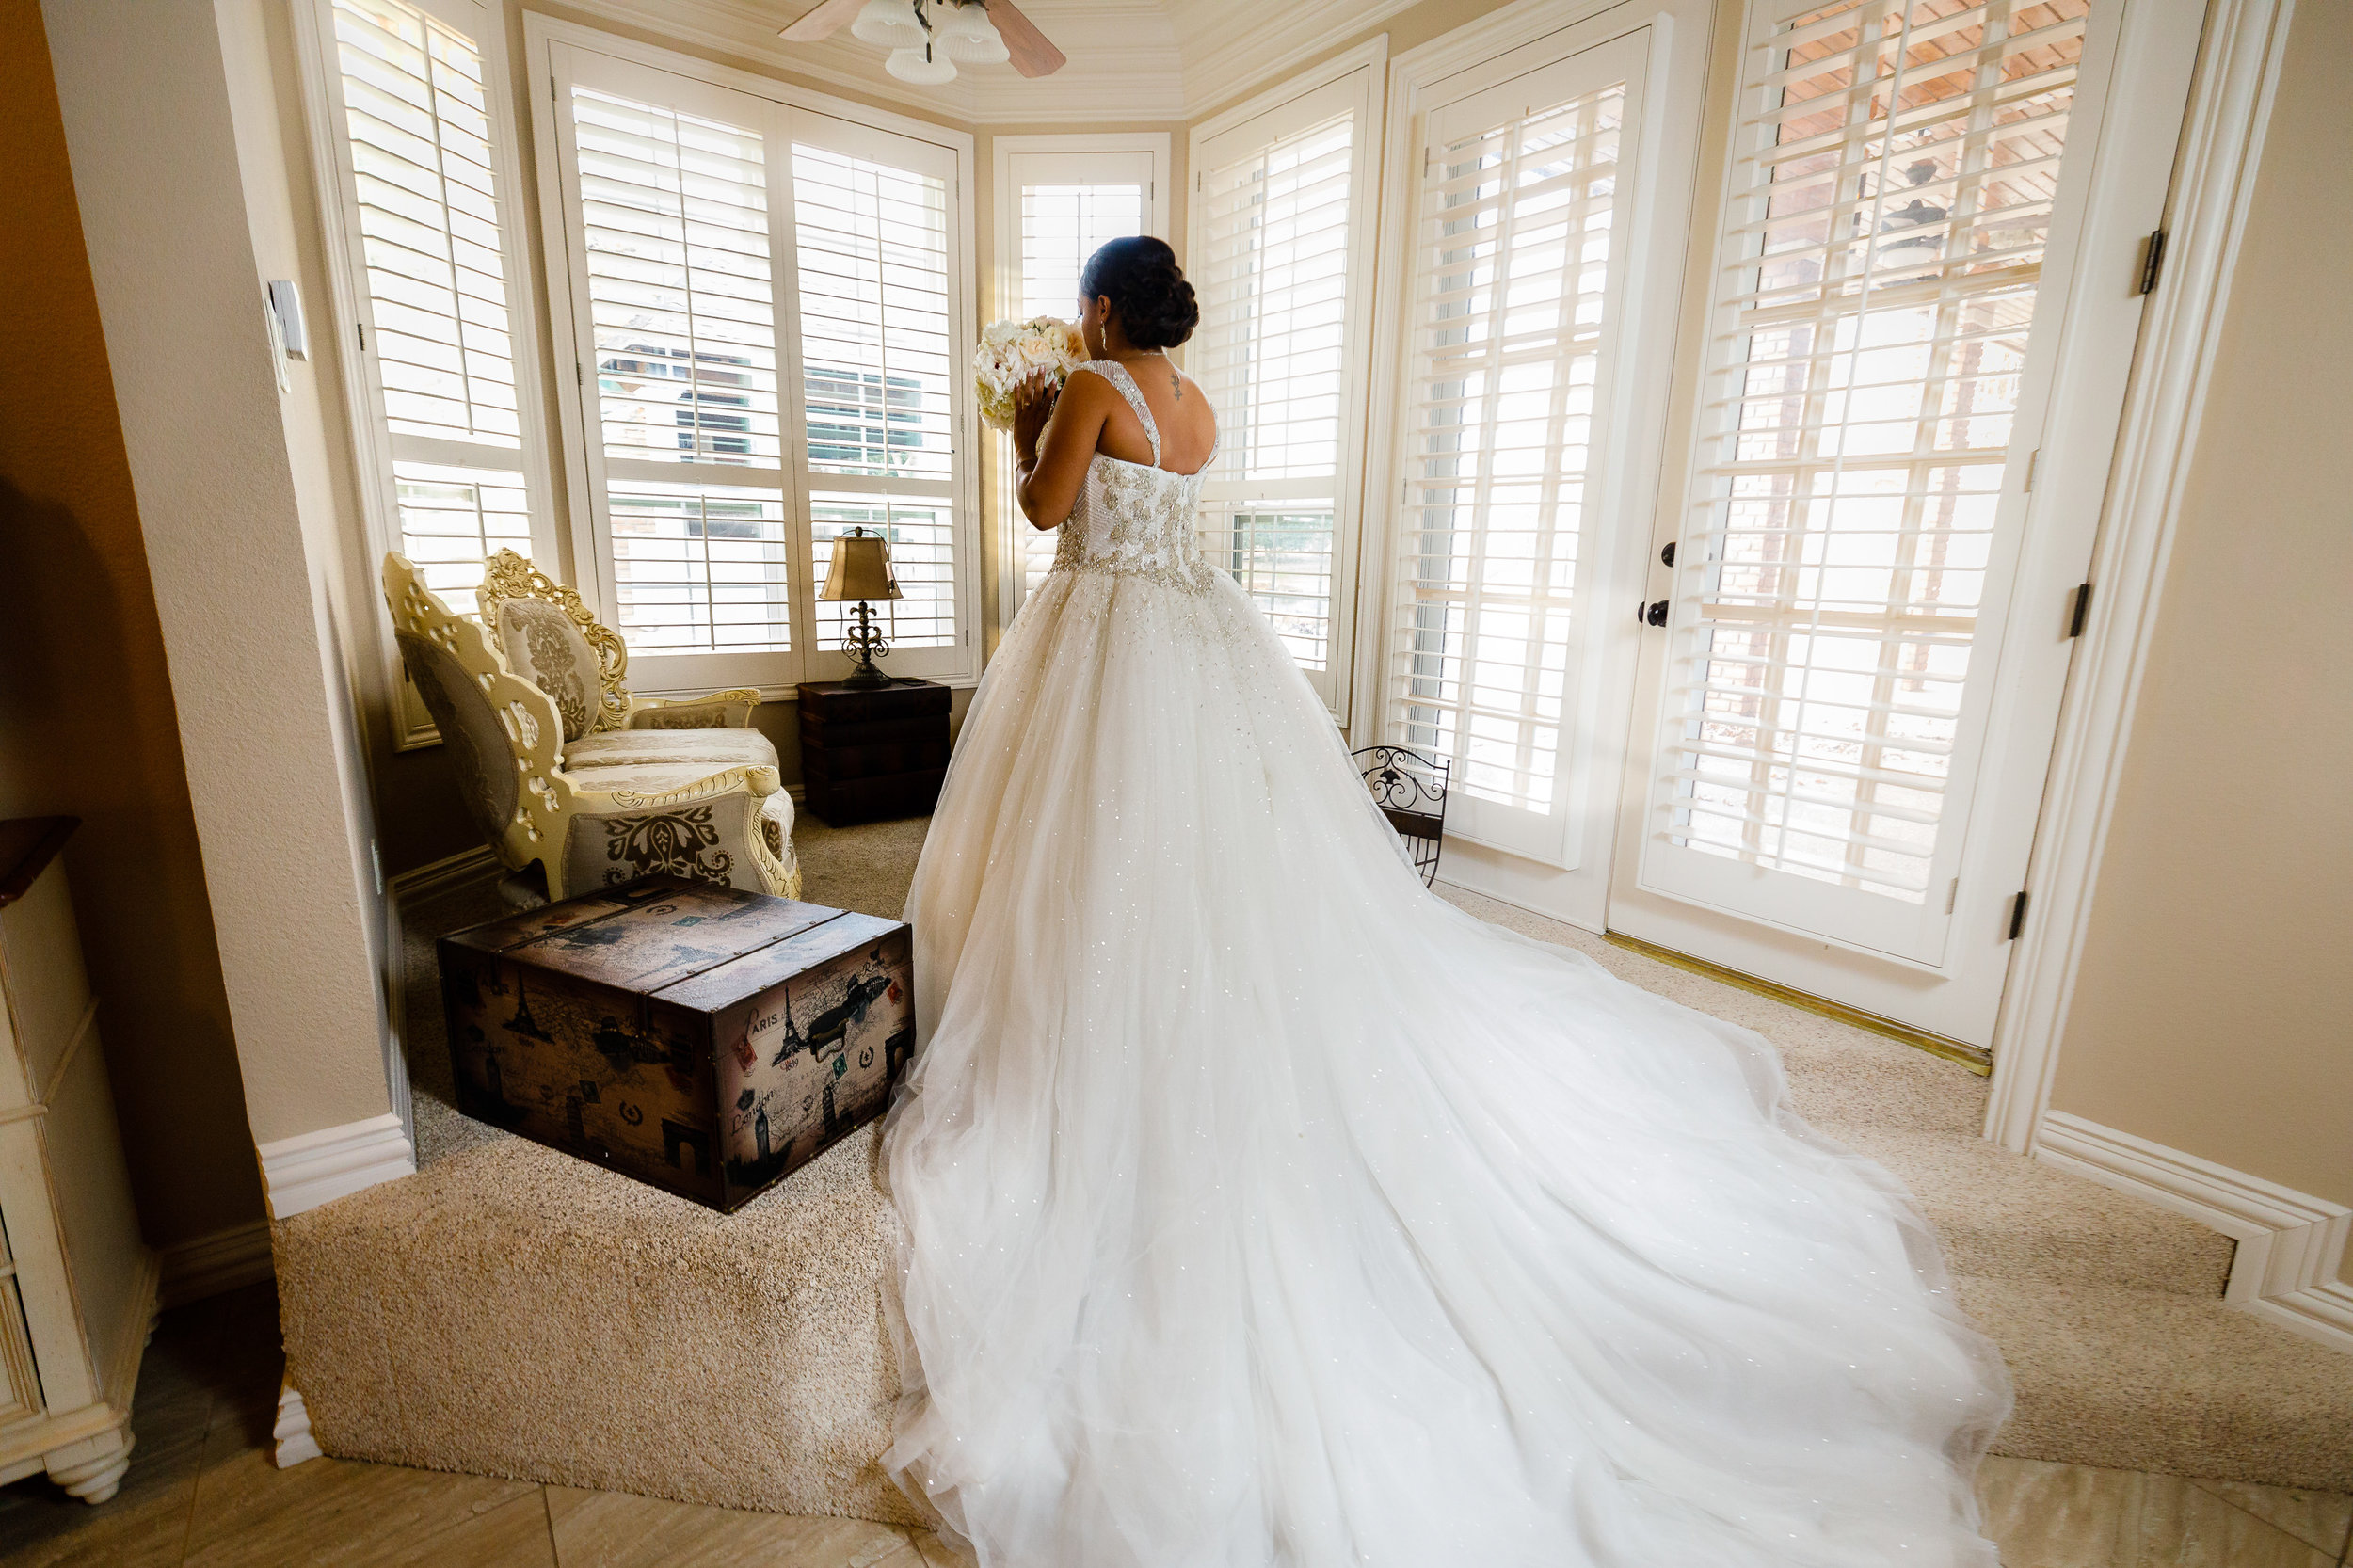 Dallas-wedding-planner-swank-soiree-fort-worth-weddingTLWed1217-218.jpg